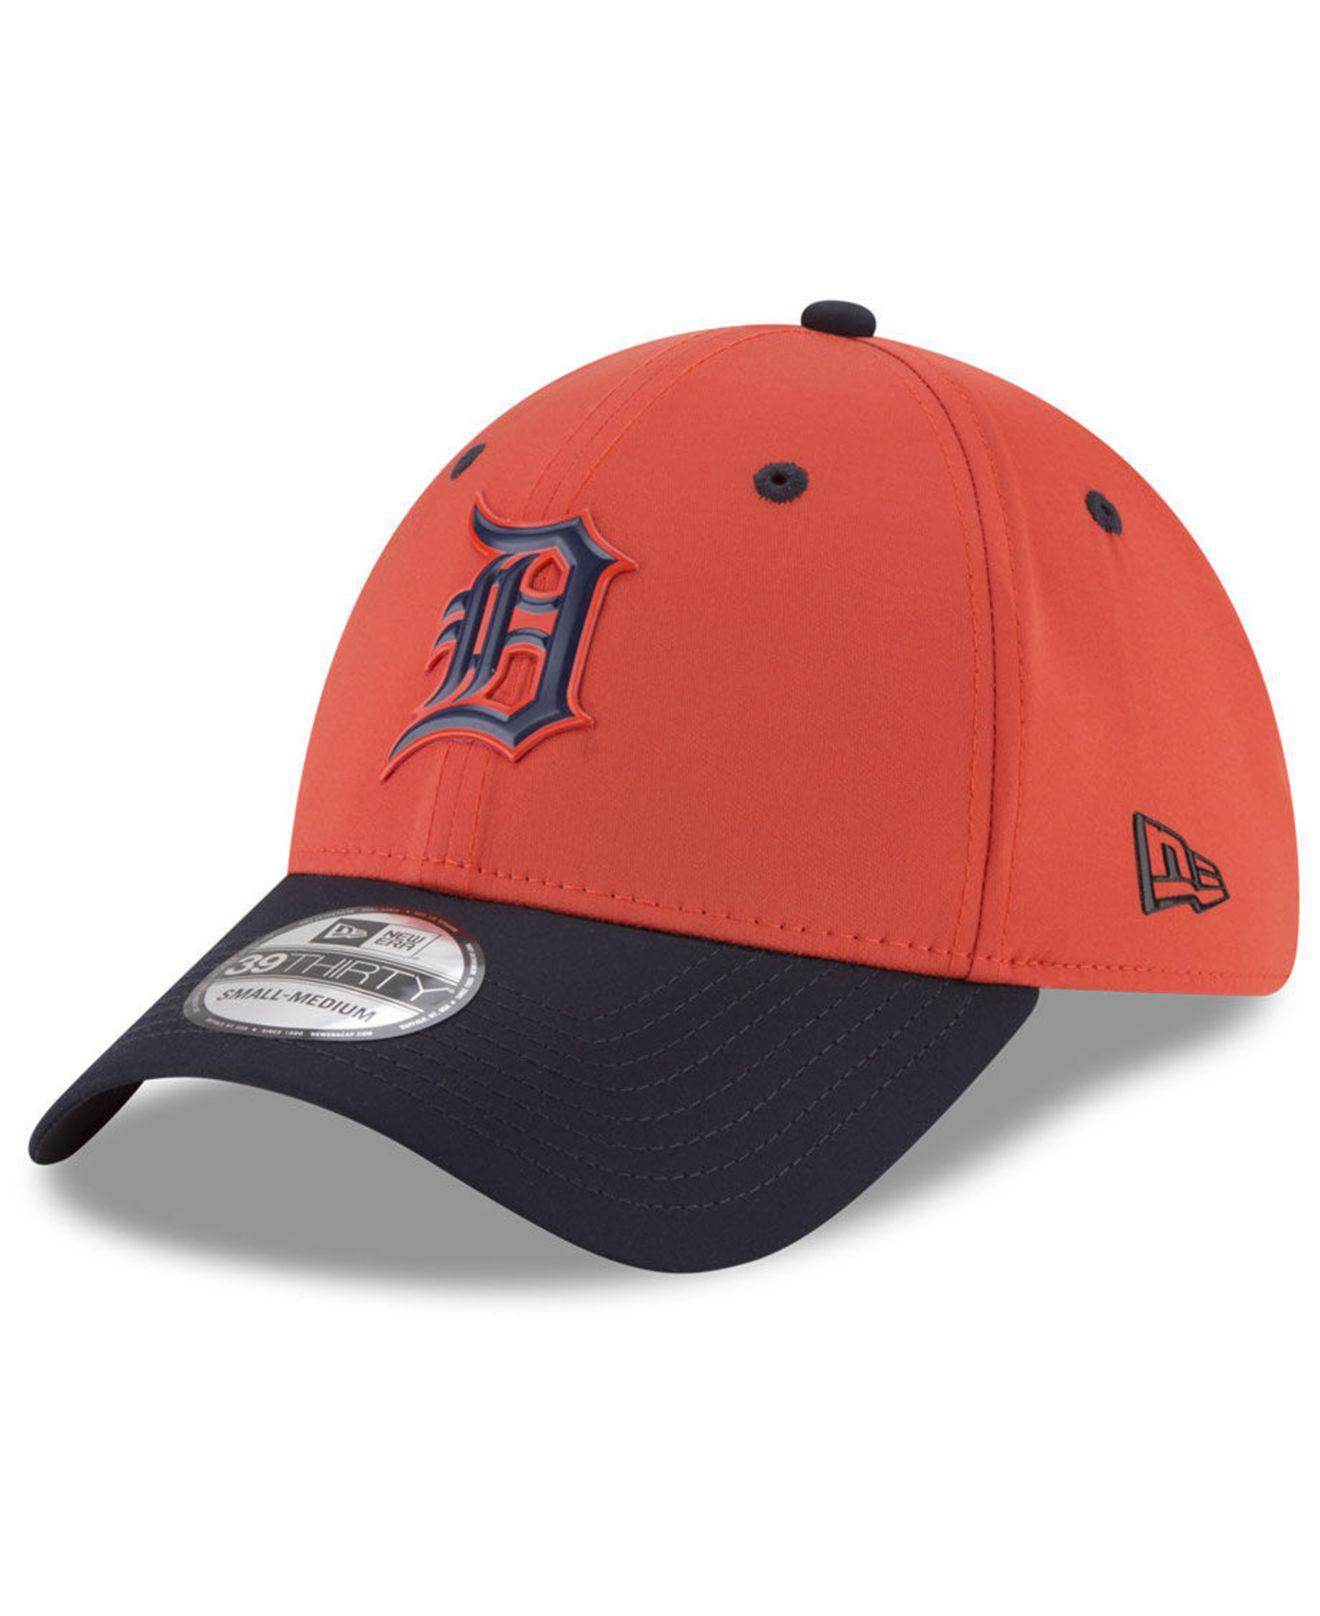 free shipping d05a6 c3722 ... Detroit Tigers Batting Practice 39thirty Cap for Men - Lyst. View  fullscreen